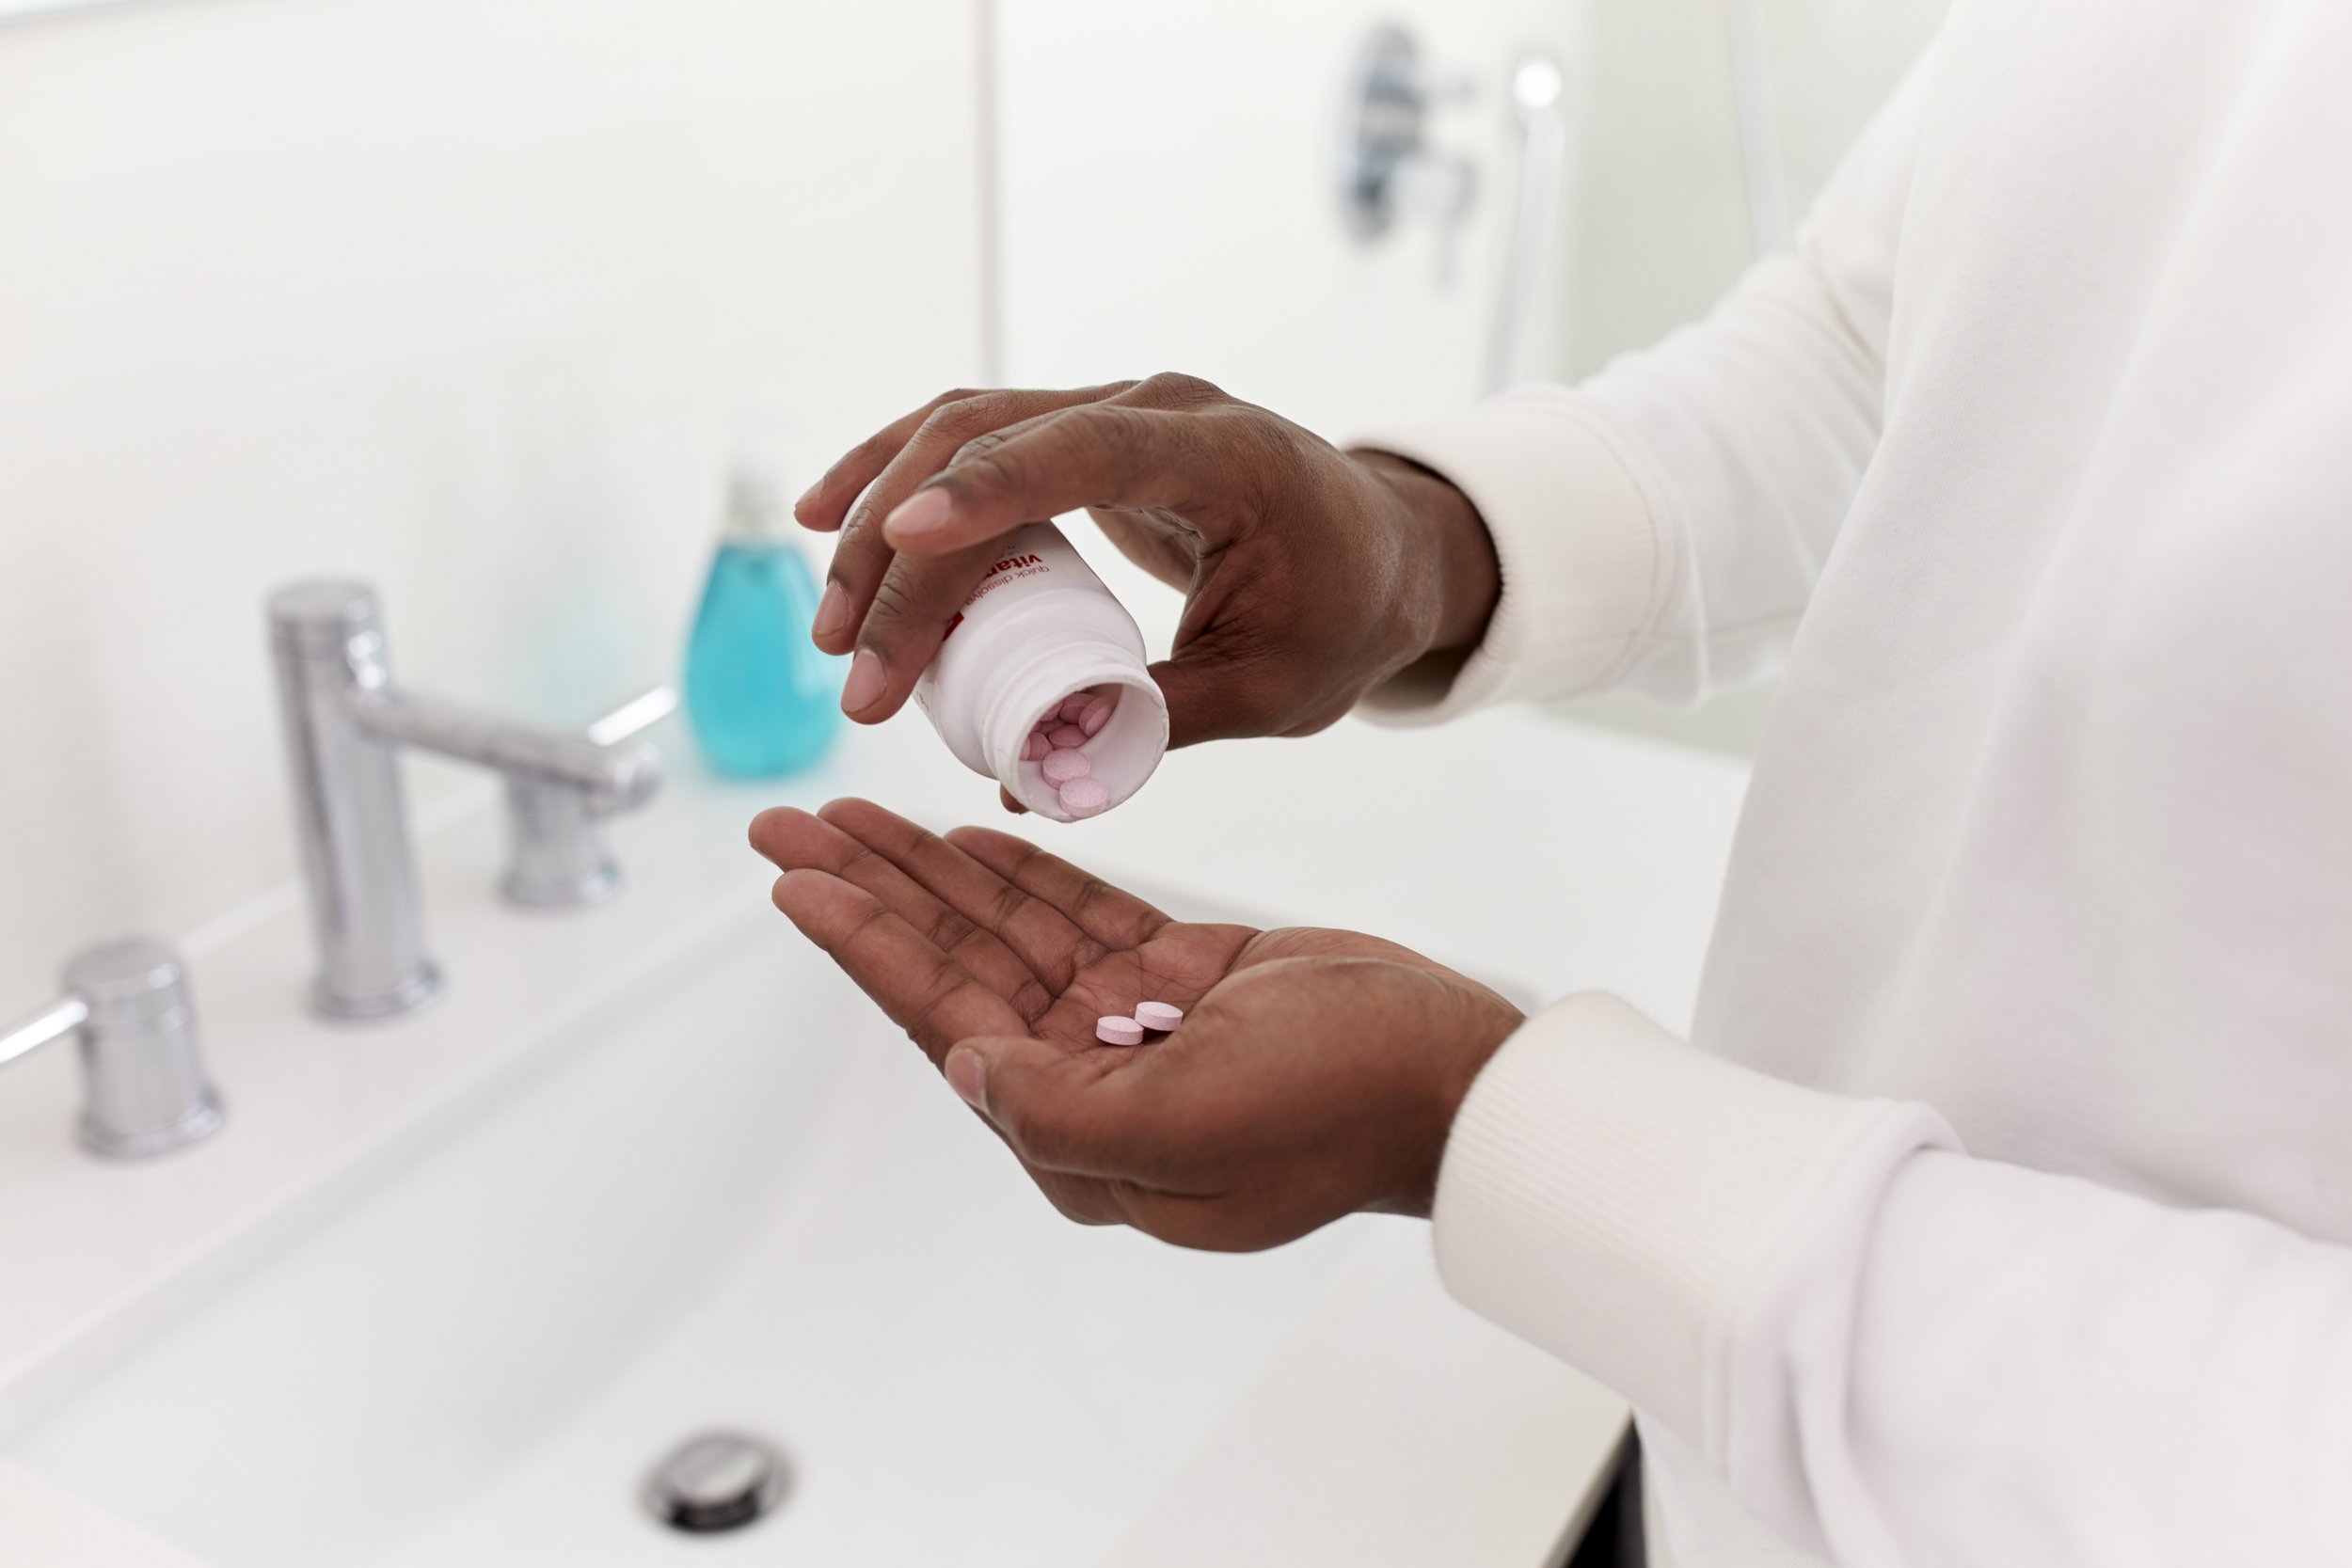 close-up-of-man-in-bathroom-taking-vitamin-56BM7SK.jpg